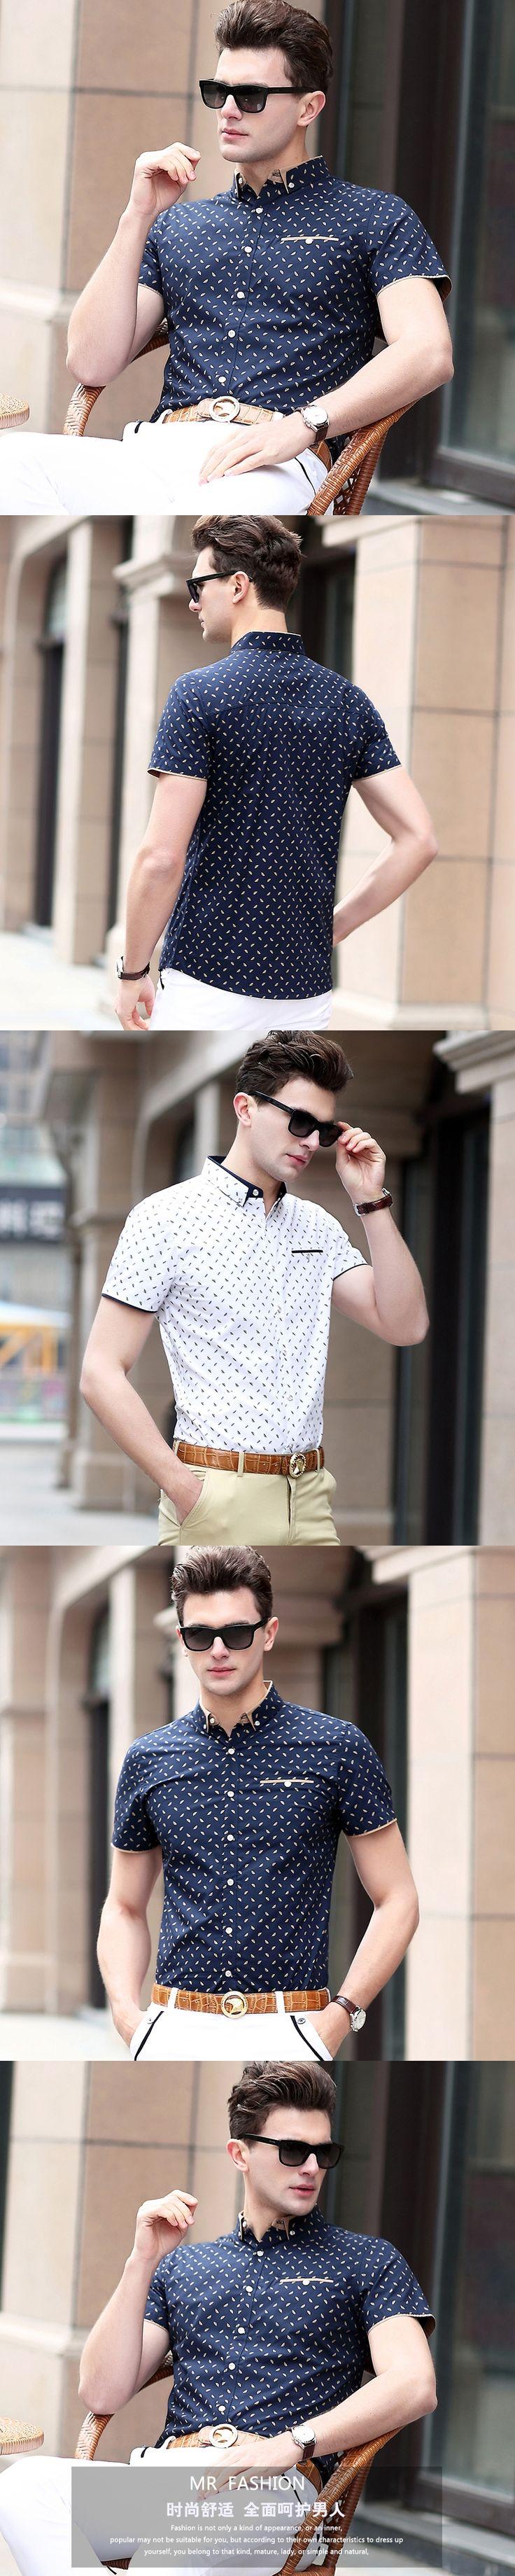 Free Shipping New Arrival 2017 Men Shirts Short Sleeve Striped Formal Man Cotton Shirt Summer Male Dress Shirts